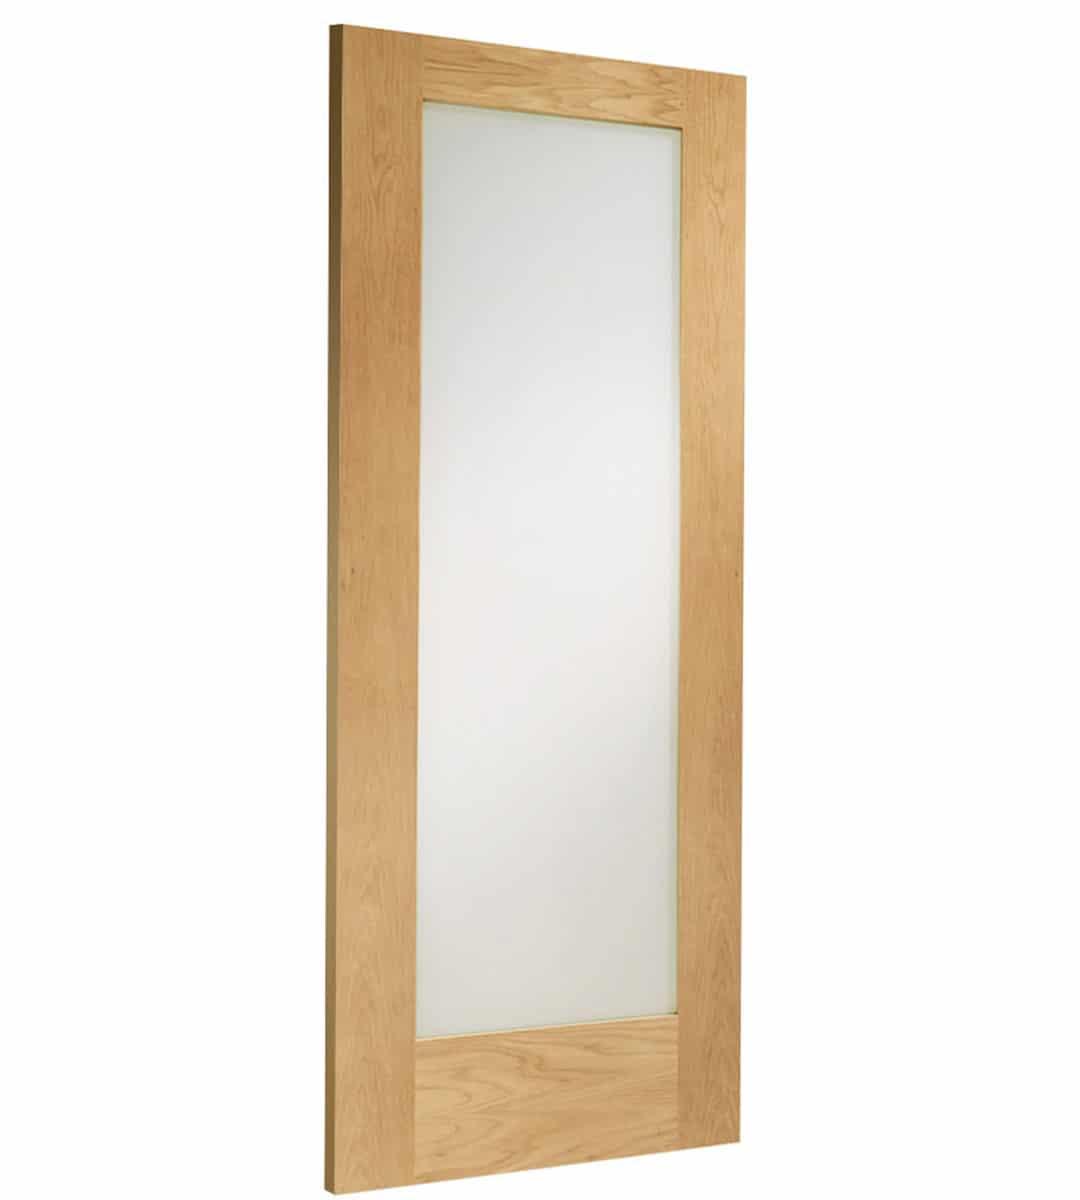 Clear glass interior doors - Pattern 10 Internal Oak Door With Clear Glass Skew